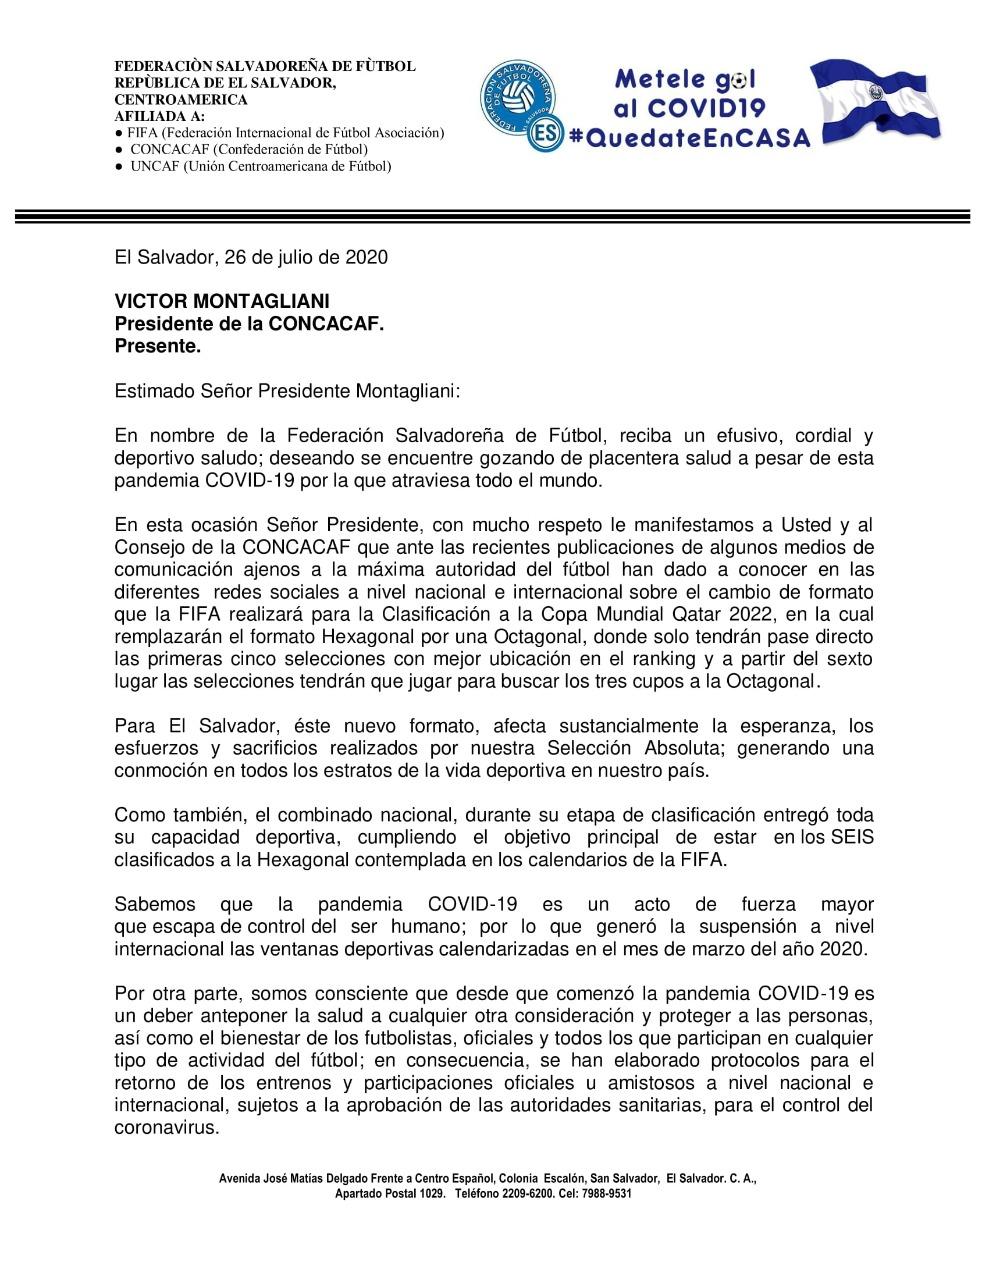 Nuevo Formato para la Clasificatoria de Concacaf a la Copa Mundial de la FIFA Catar 2022 Ed9d0YRXsAA0OTc?format=jpg&name=large